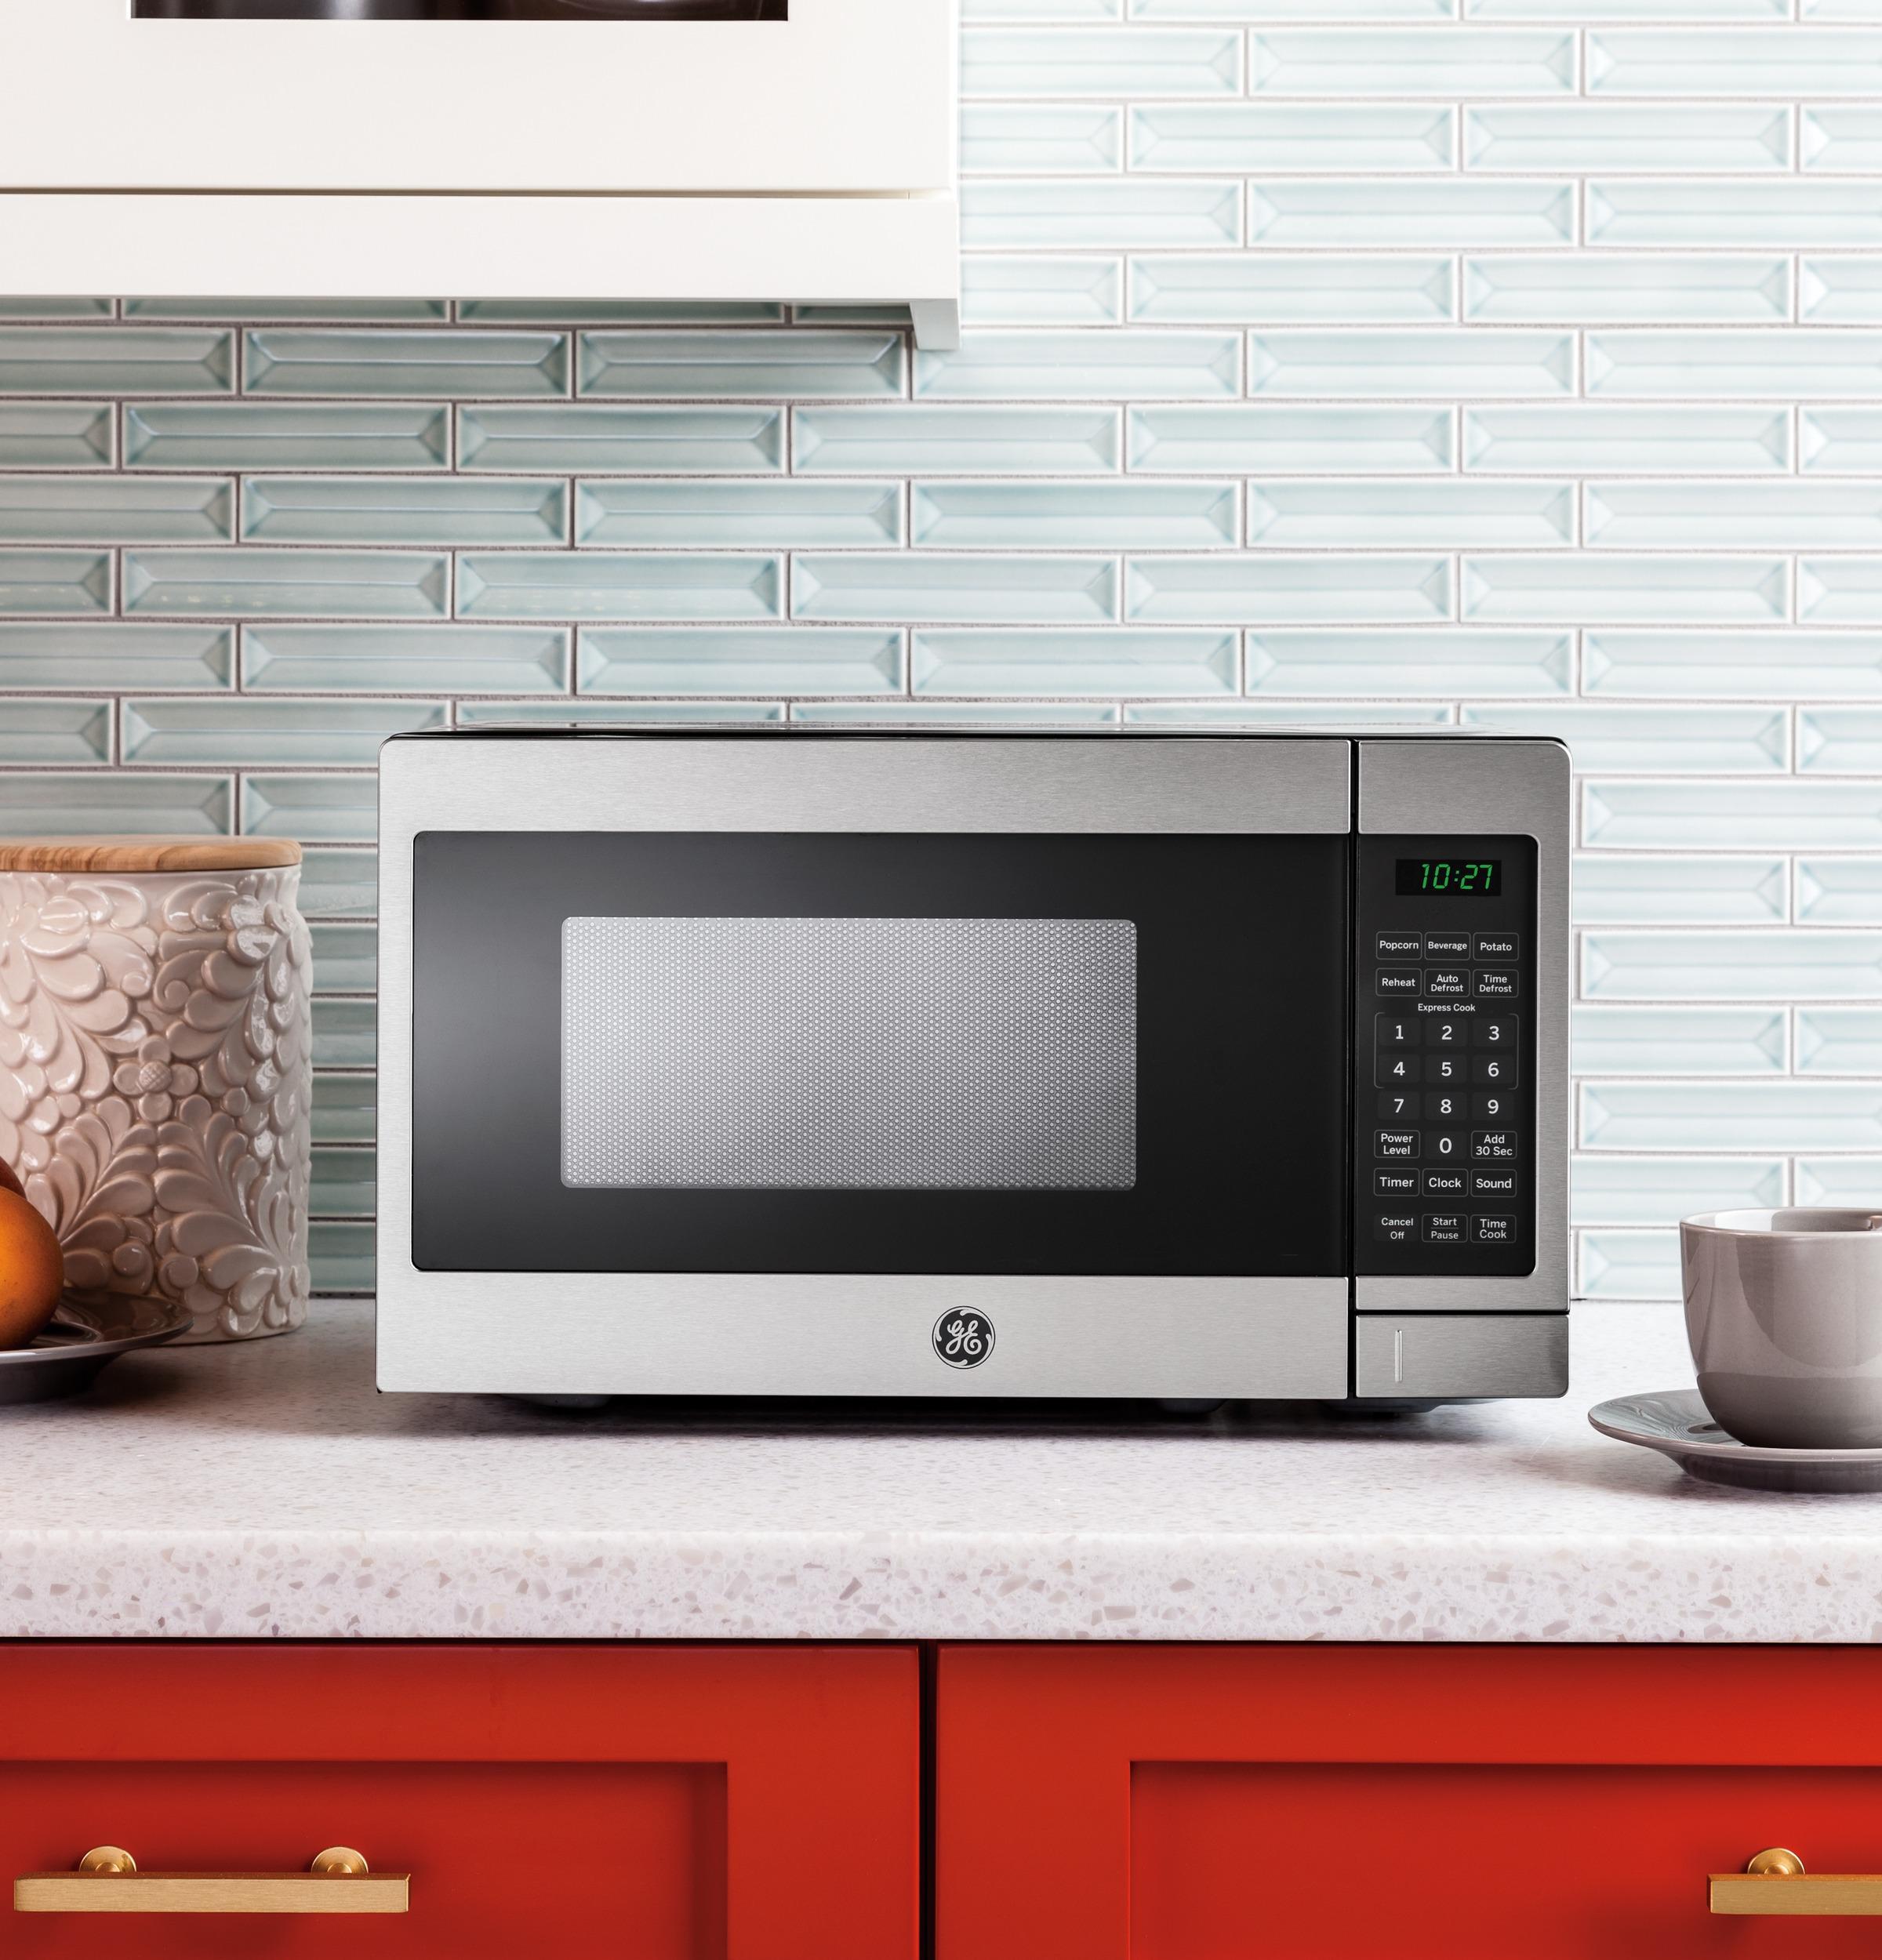 Jem3072 General Electric Jem3072 Countertop Microwaves